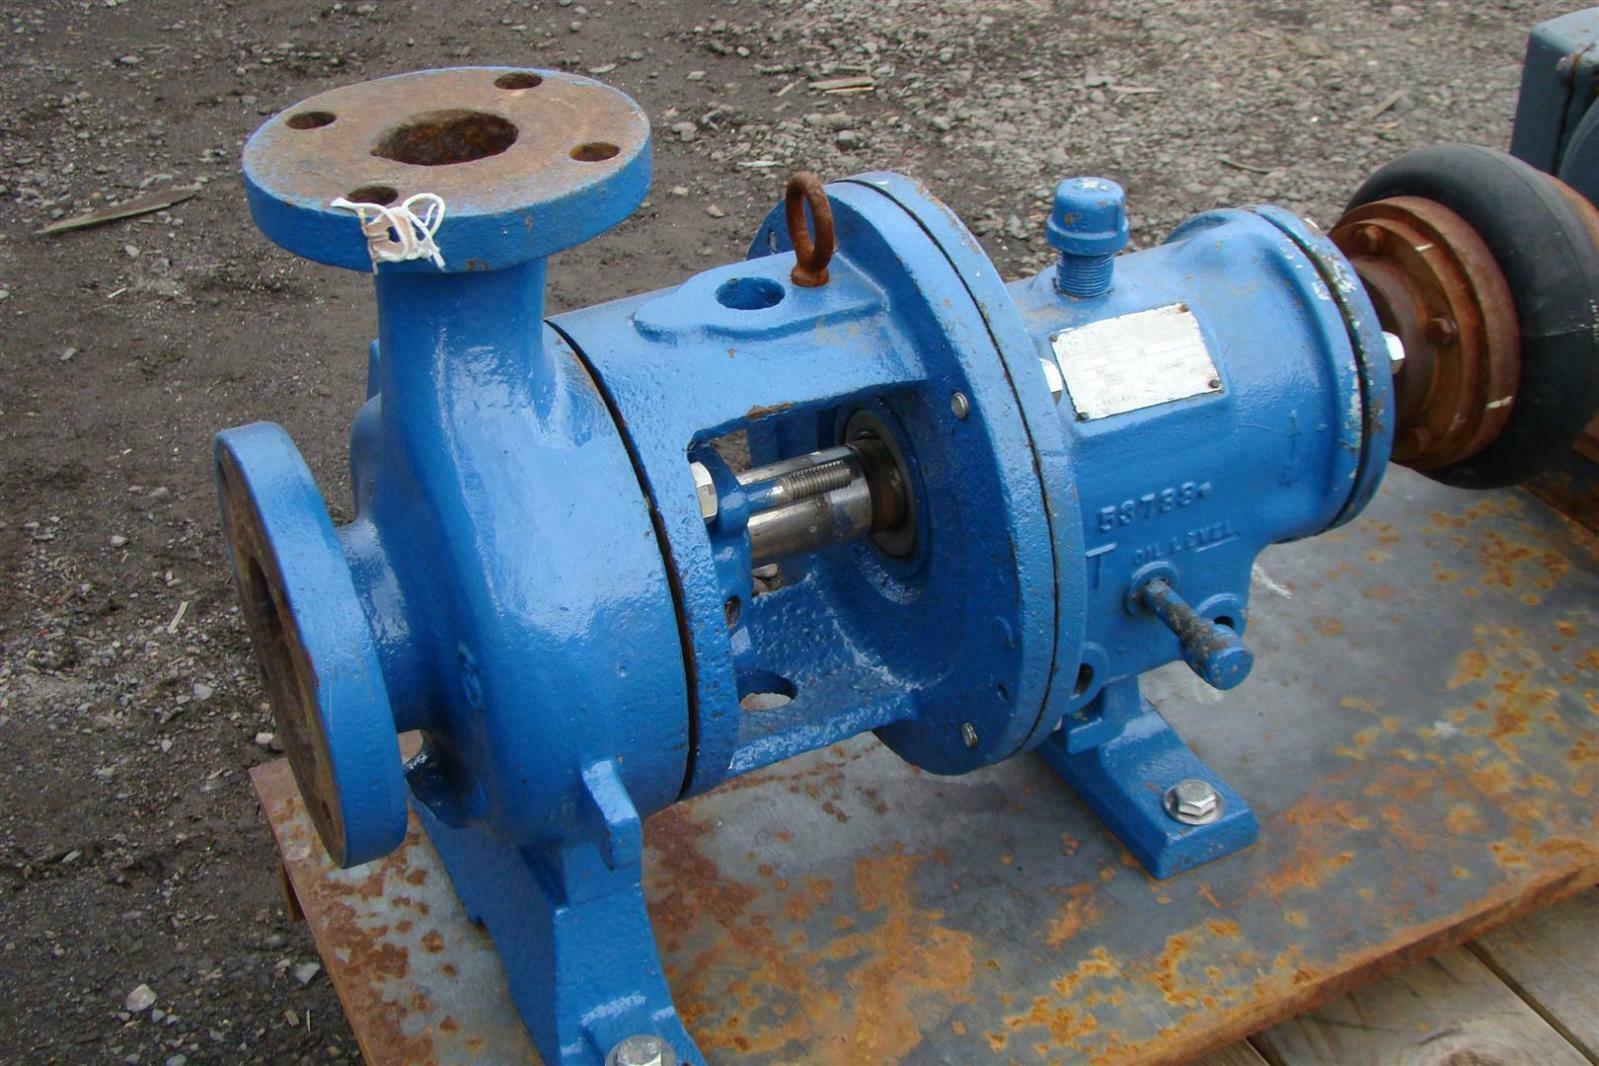 Details about Goulds MT 7 5 HP 3 Phase Process Pump Size 4x6-10 3196